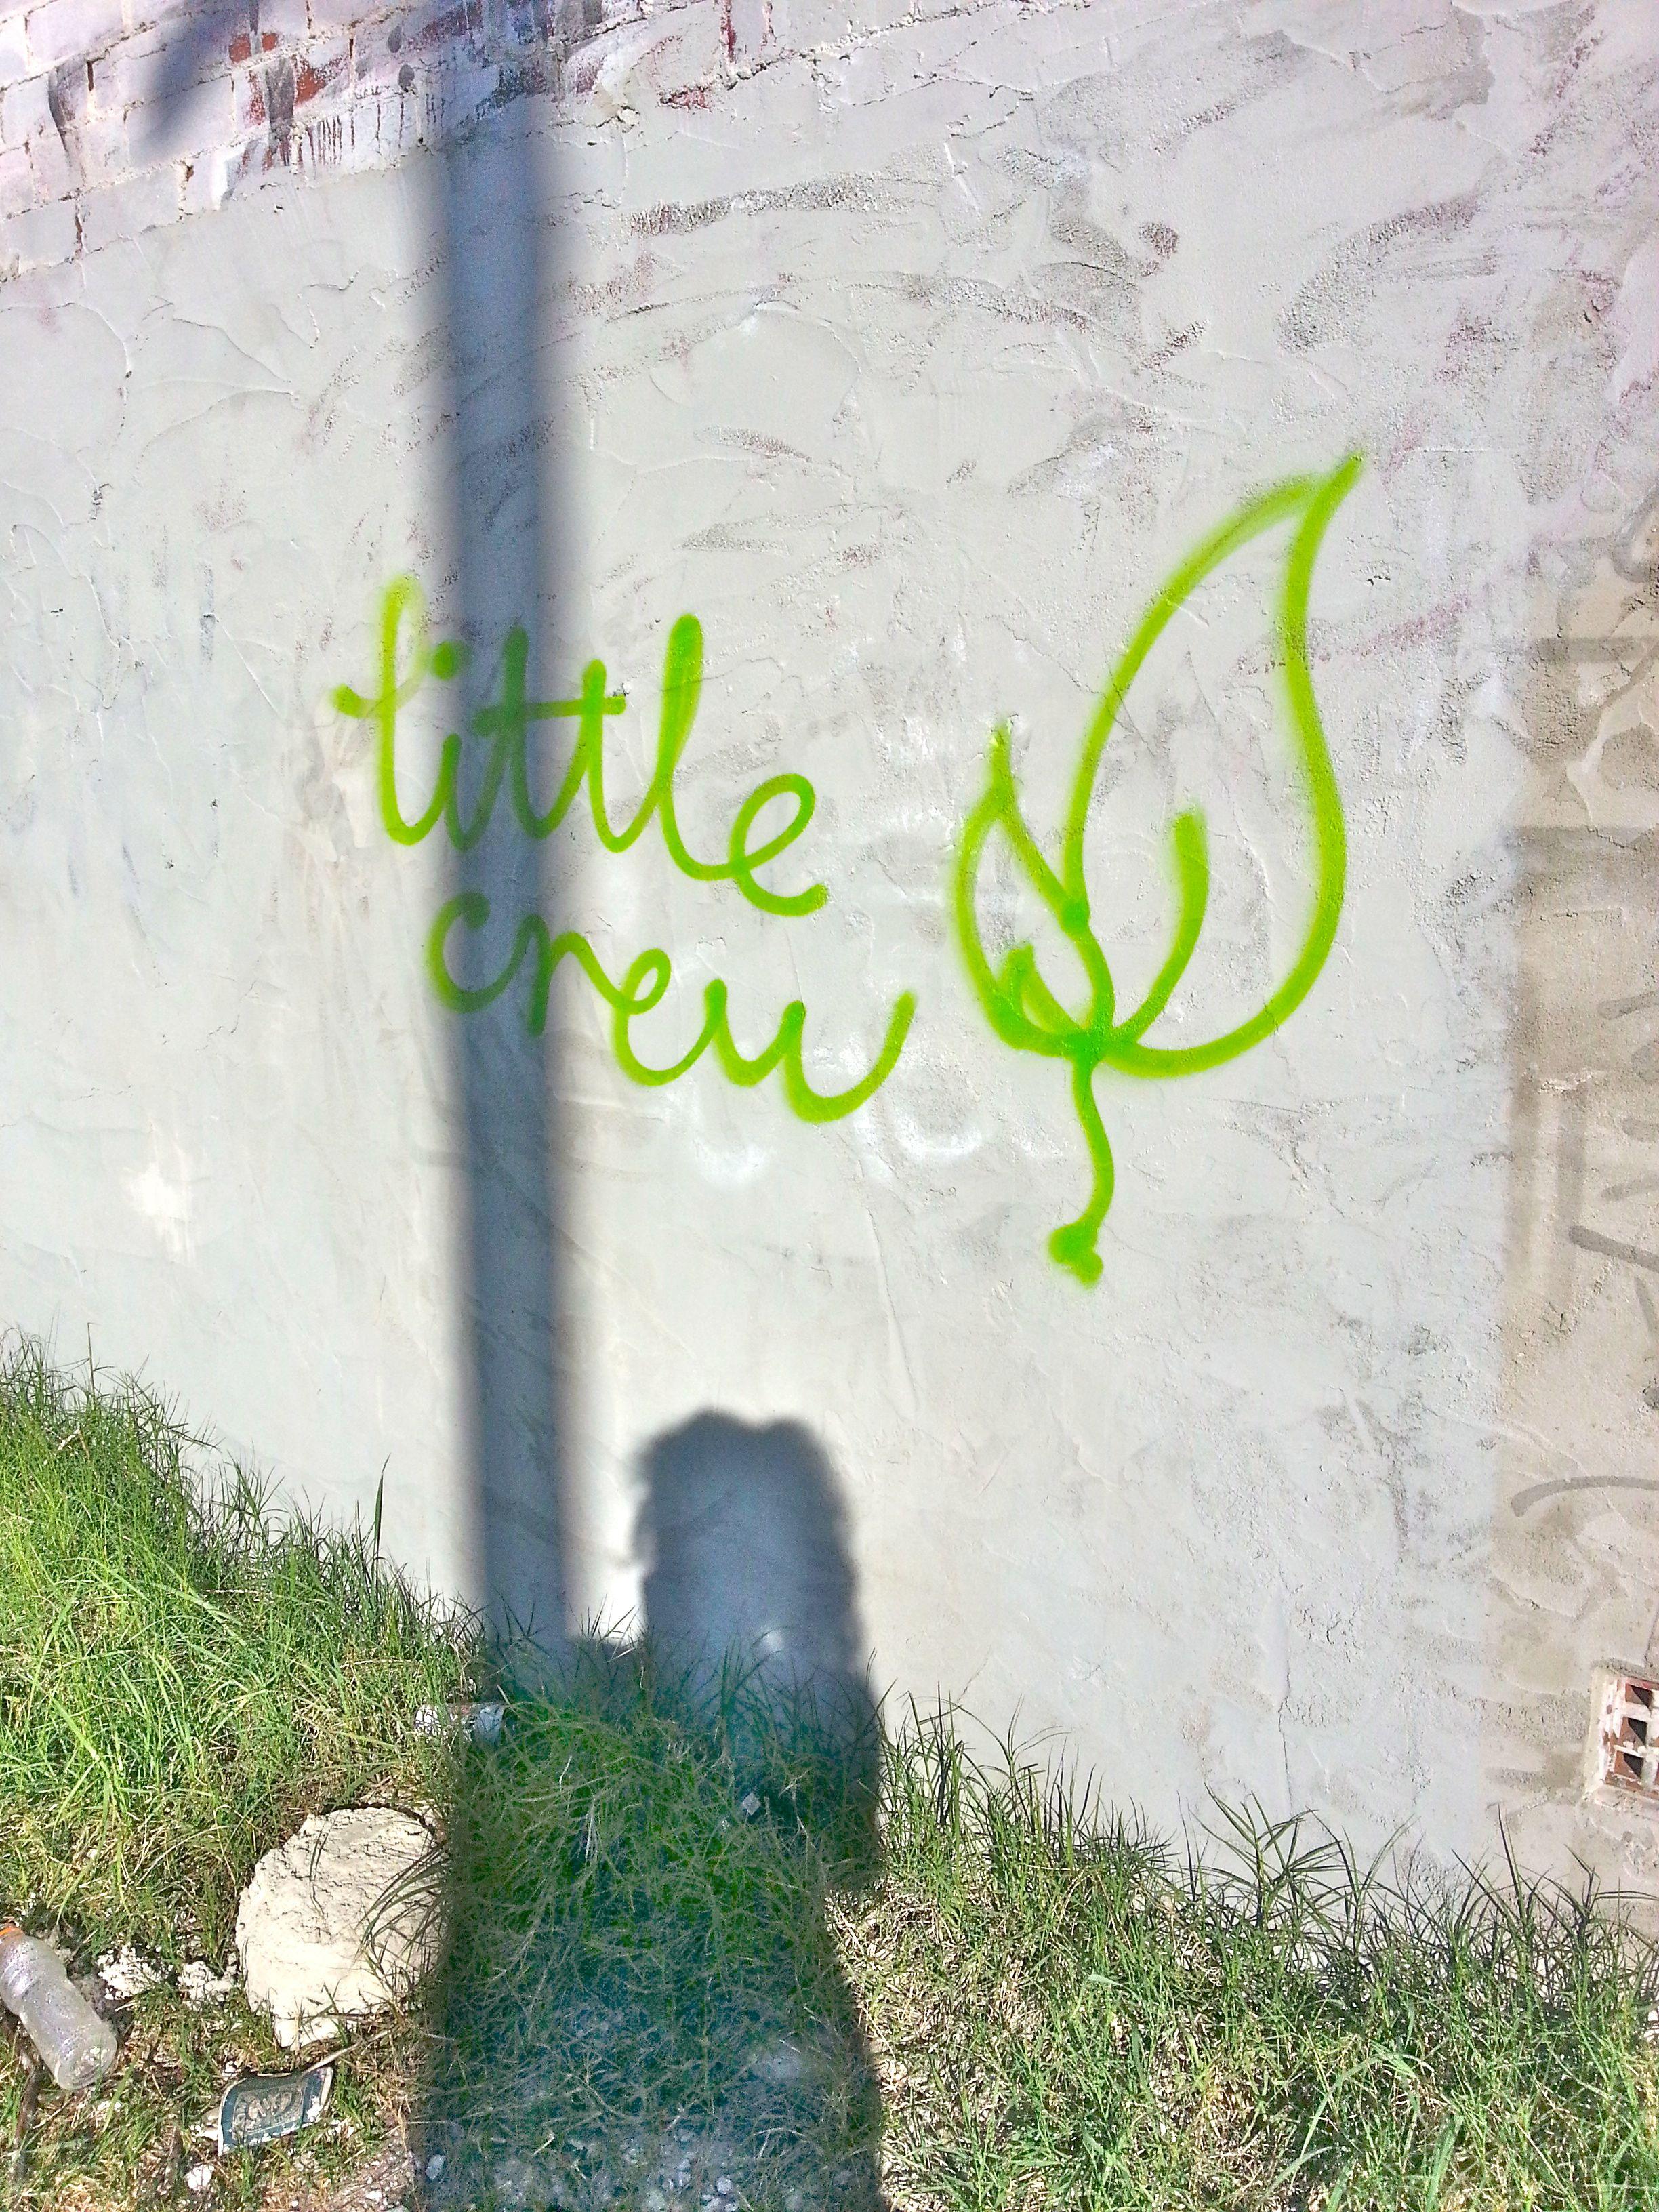 Yep, even Perth street art.